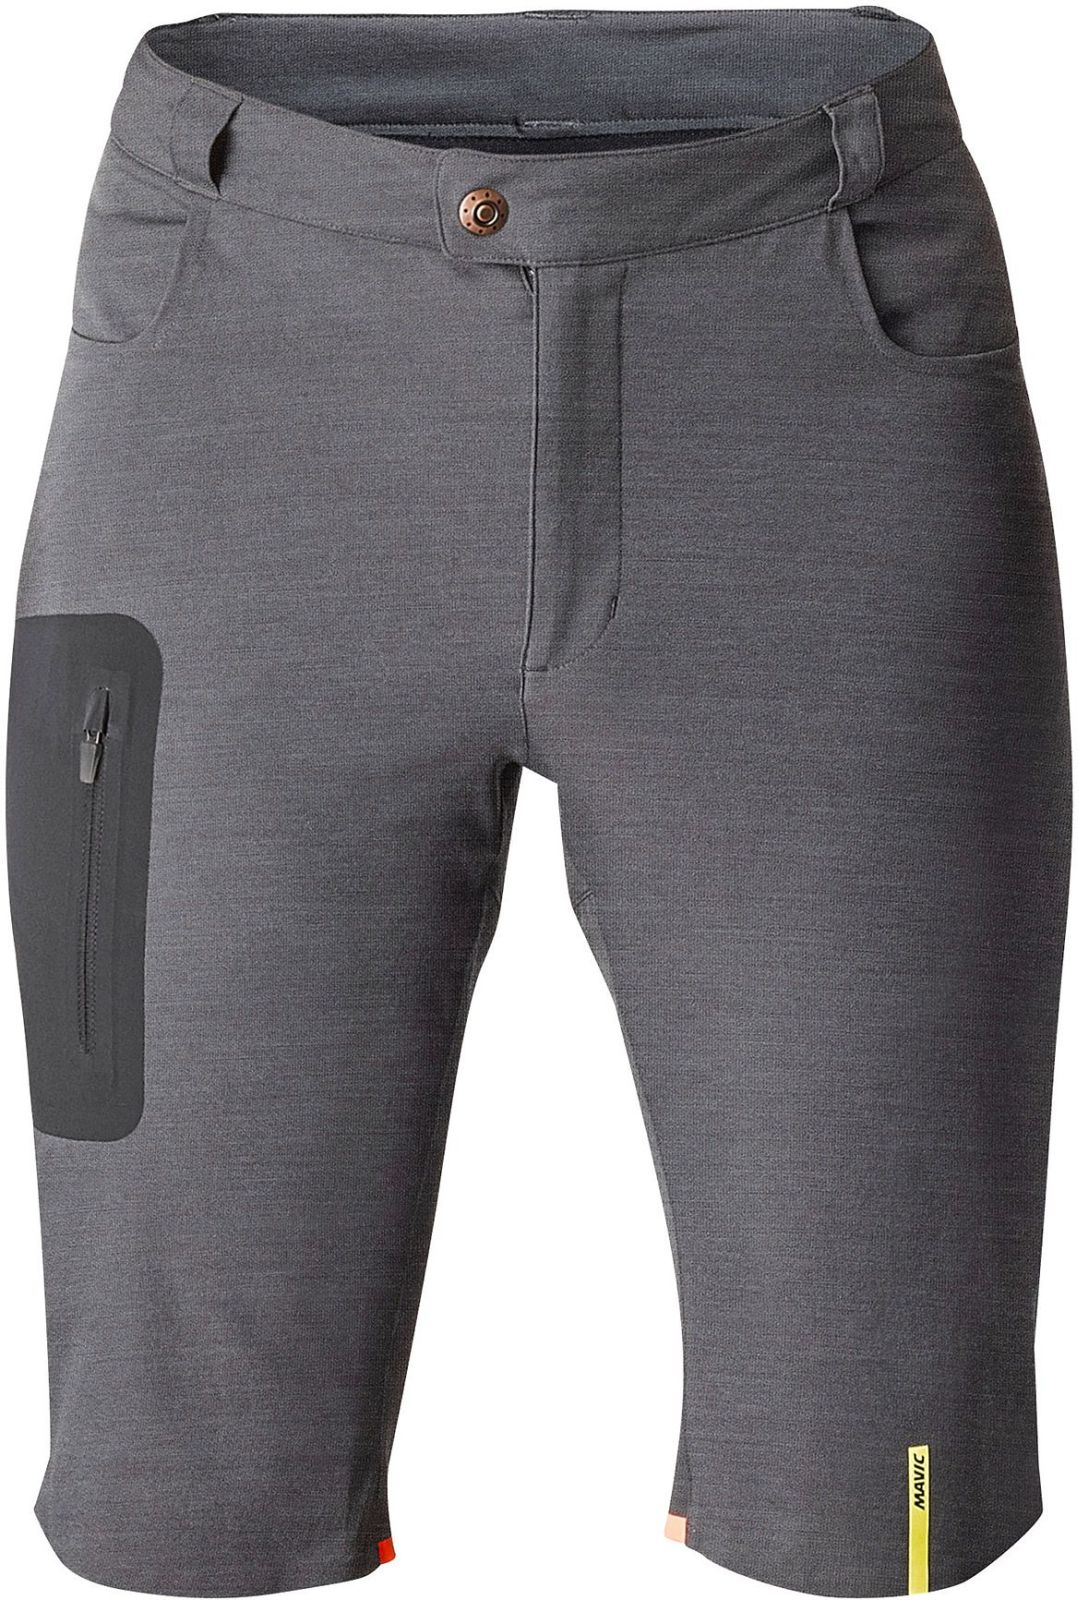 Mavic Allroad Fitted Baggy Short - Asphalt XL